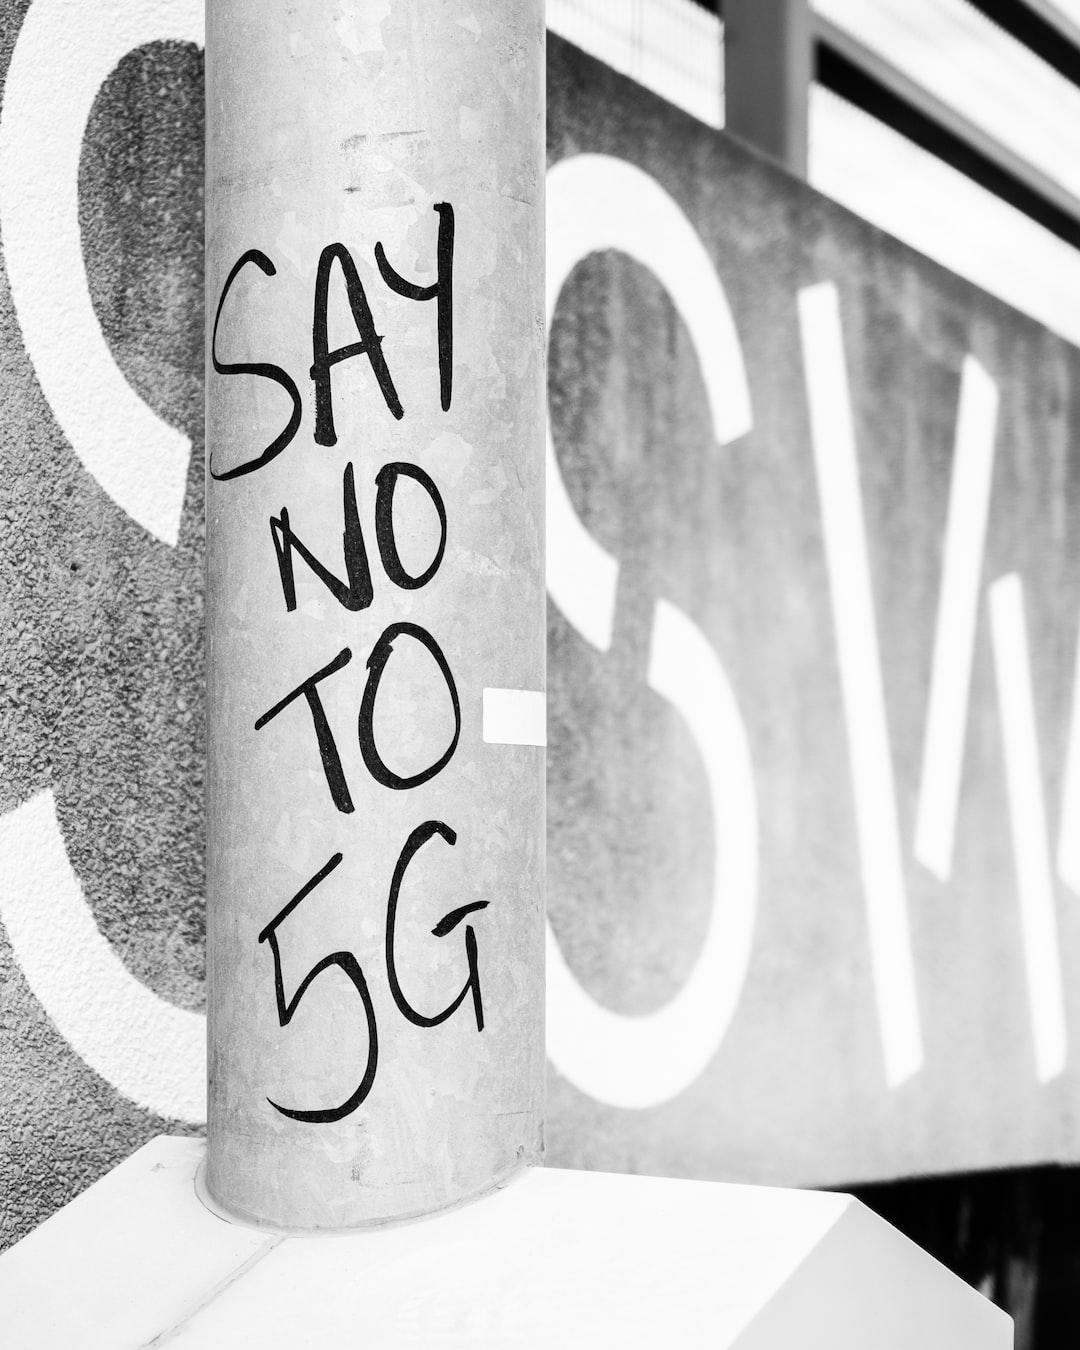 5G Graffiti in East London